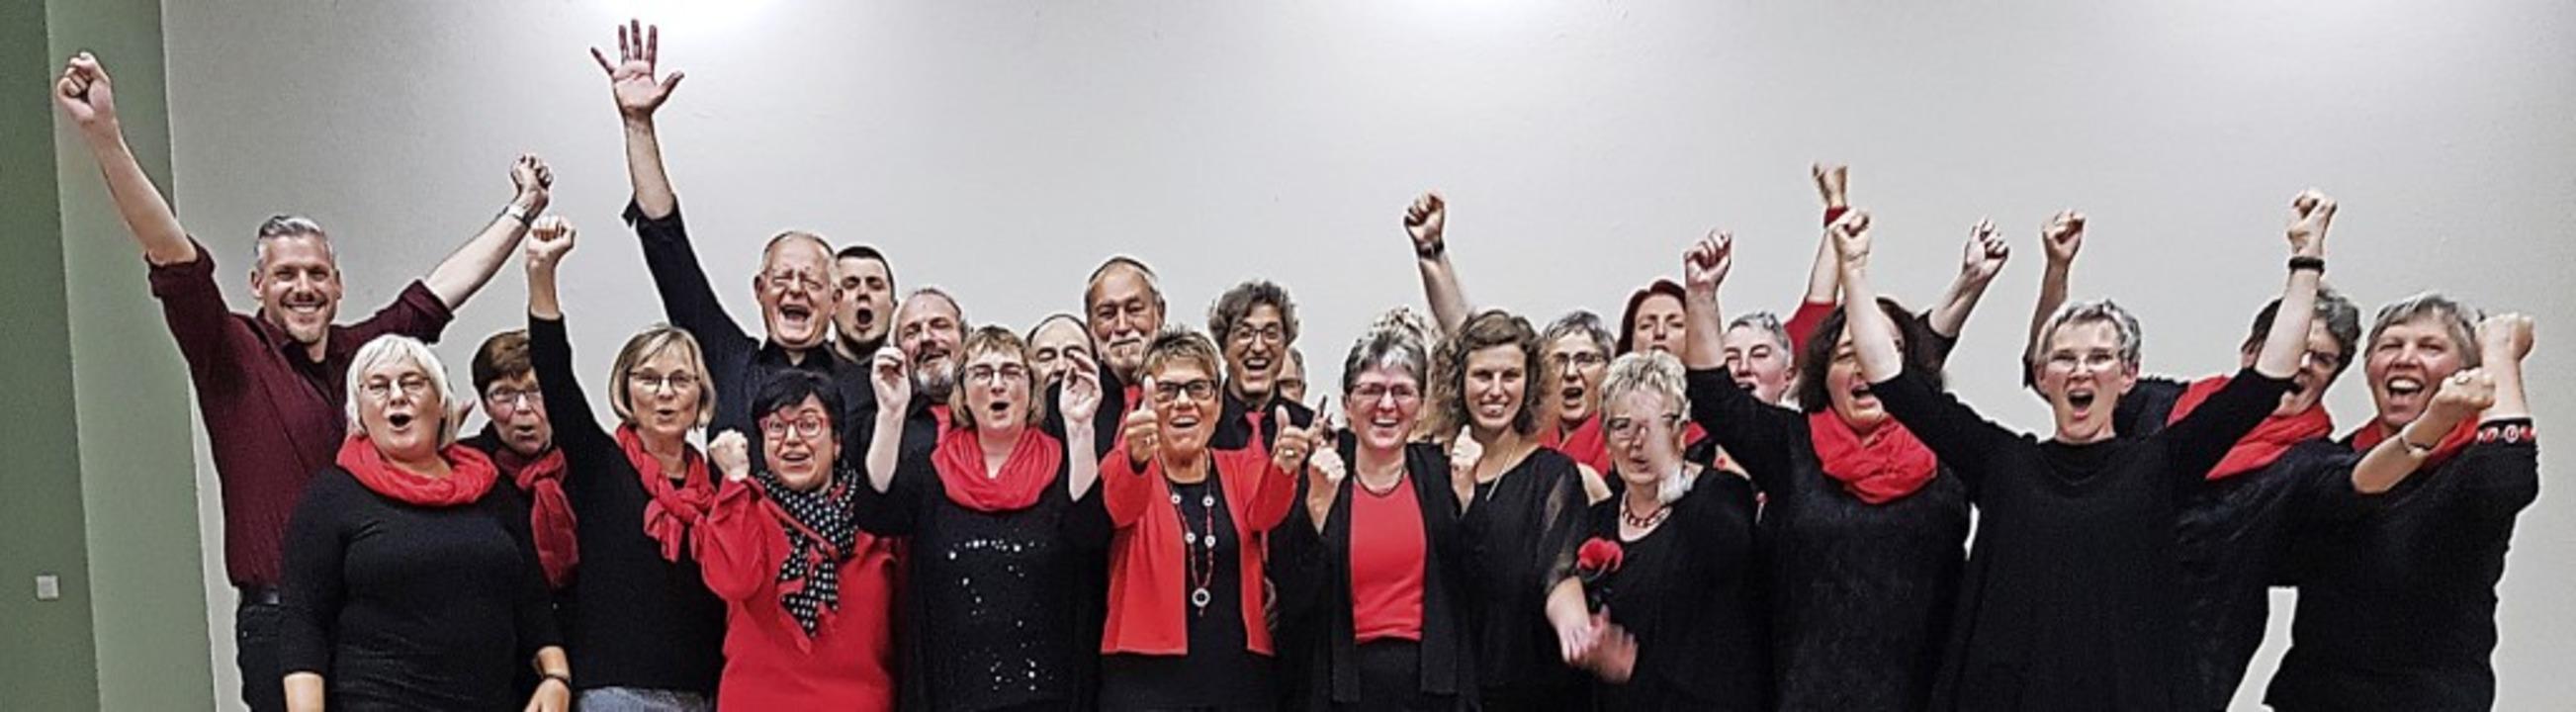 Der Jubel des Amolterer Chors war groß...m Erfolg beim Kompositionswettbewerb.   | Foto: privat